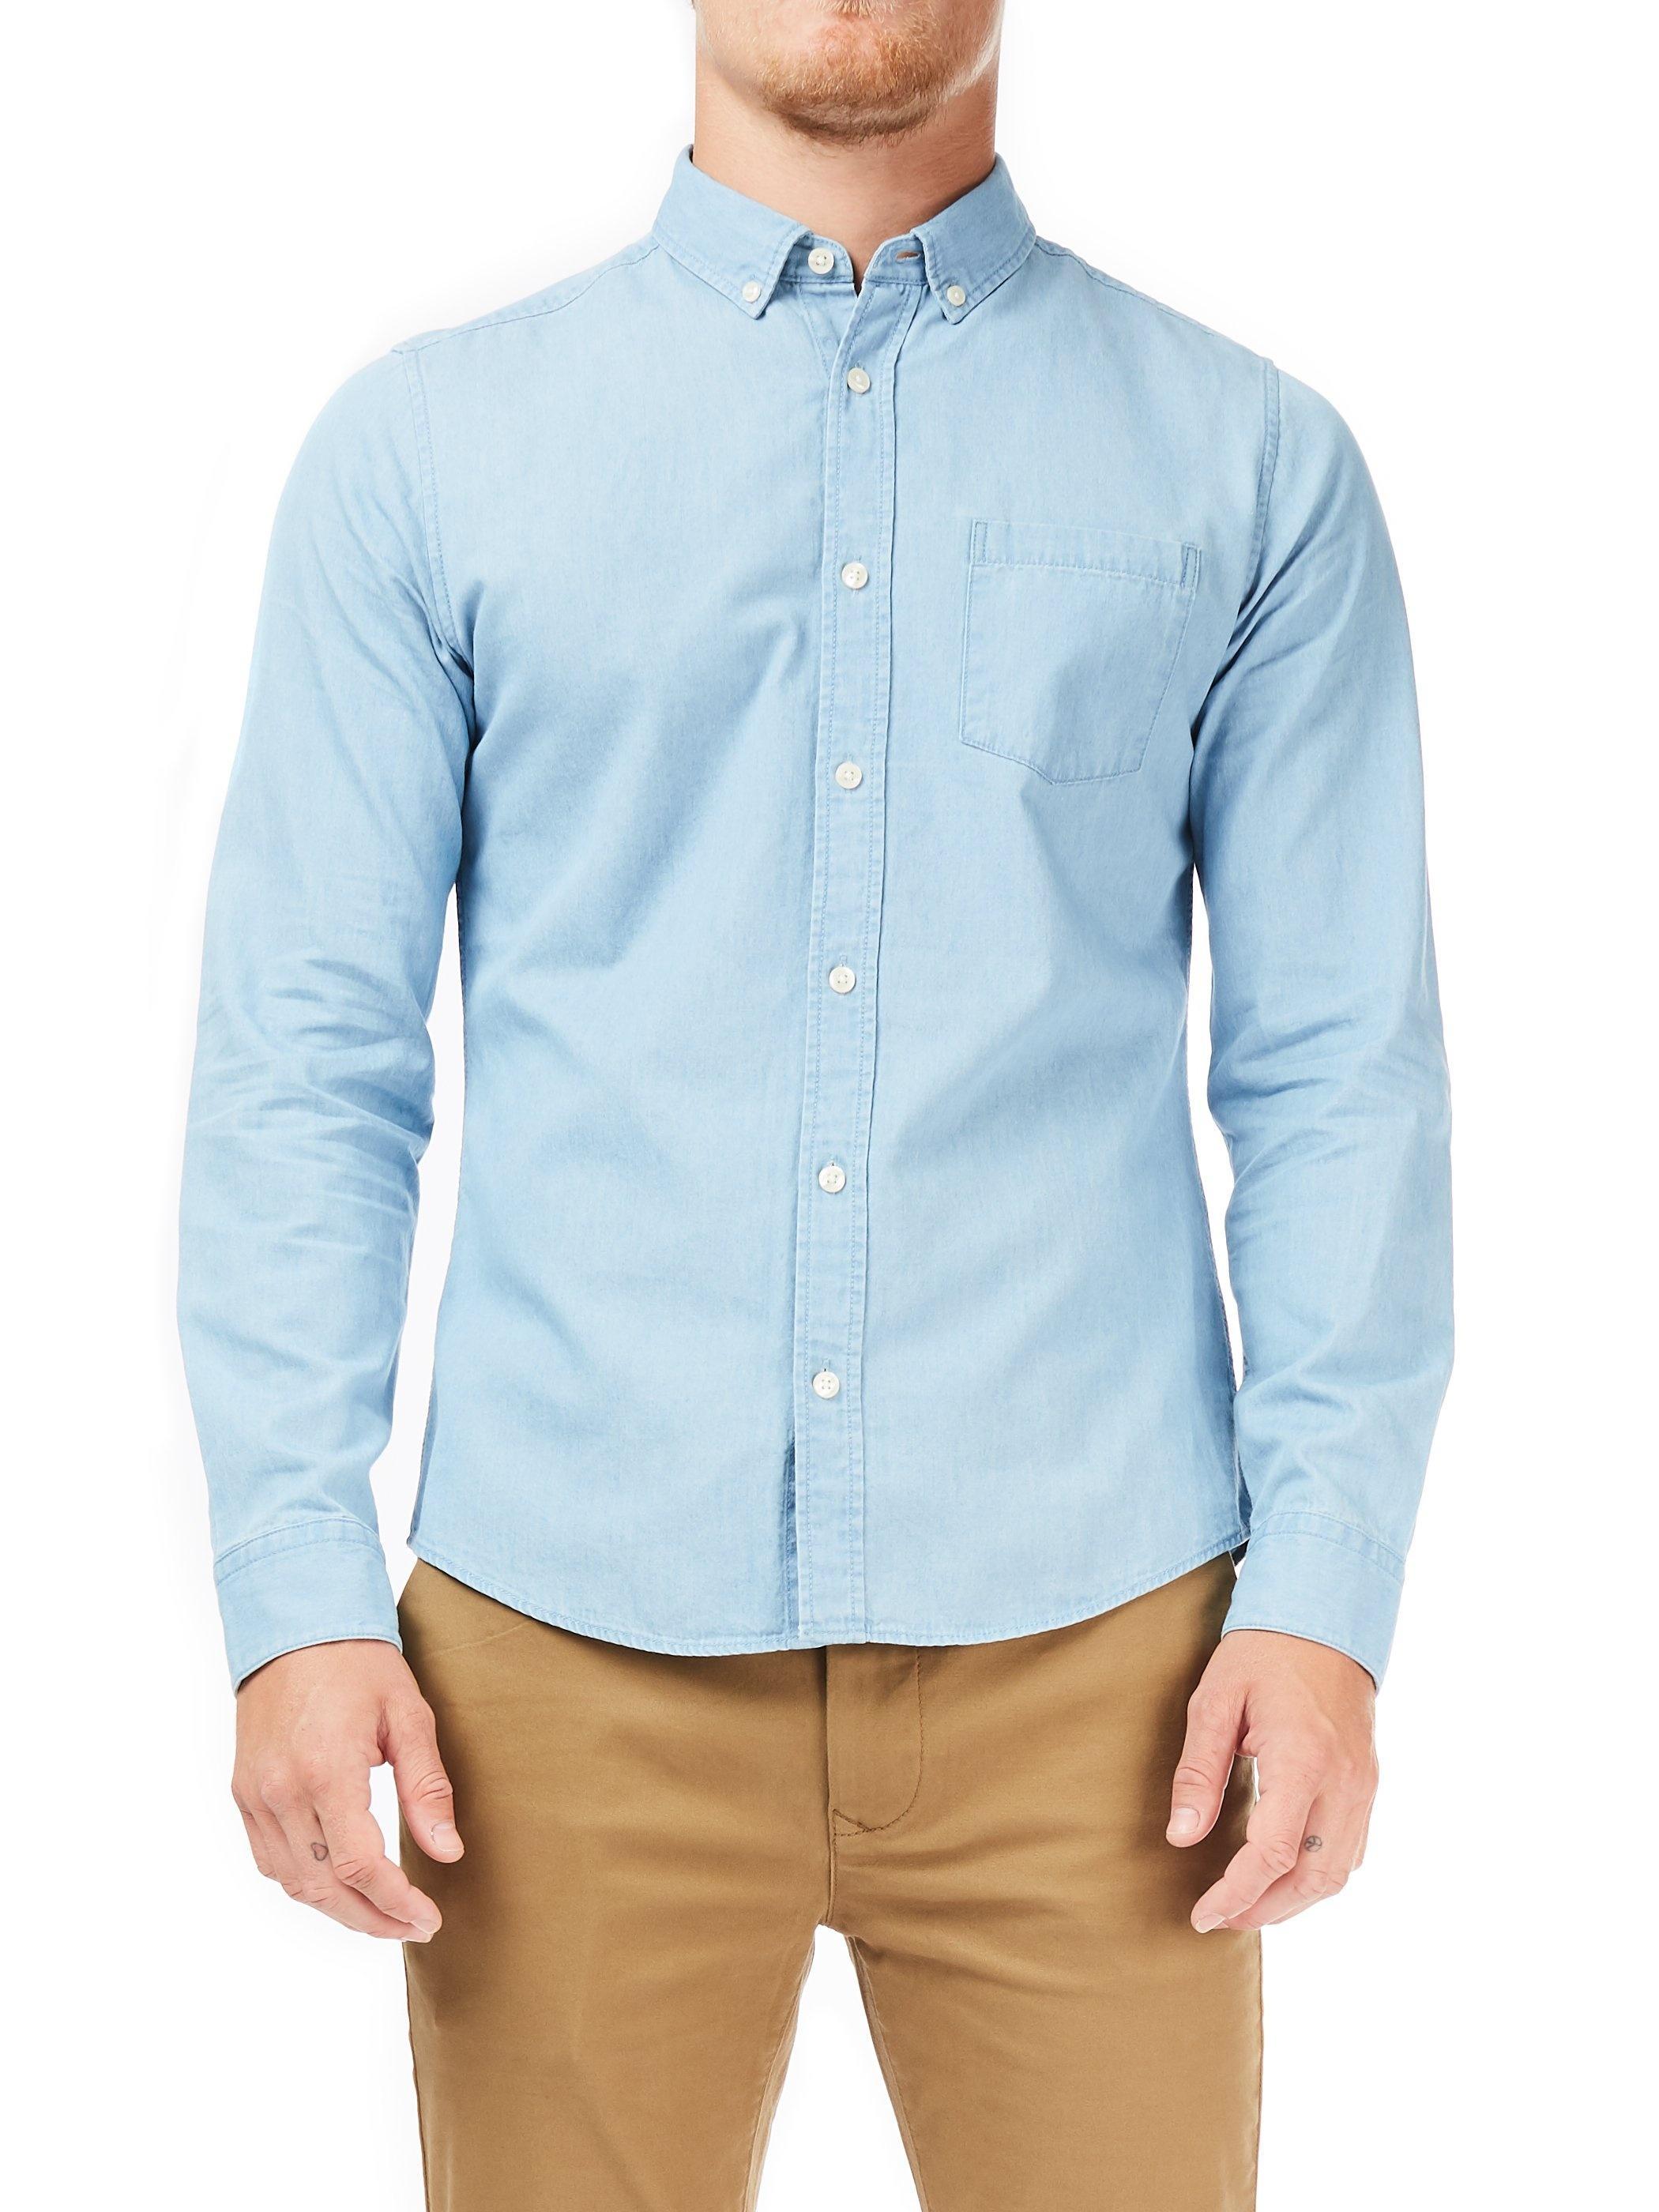 4a53ebe13e Burton Blue Light Wash Long Sleeves Denim Shirt in Blue for Men - Save 25%  - Lyst